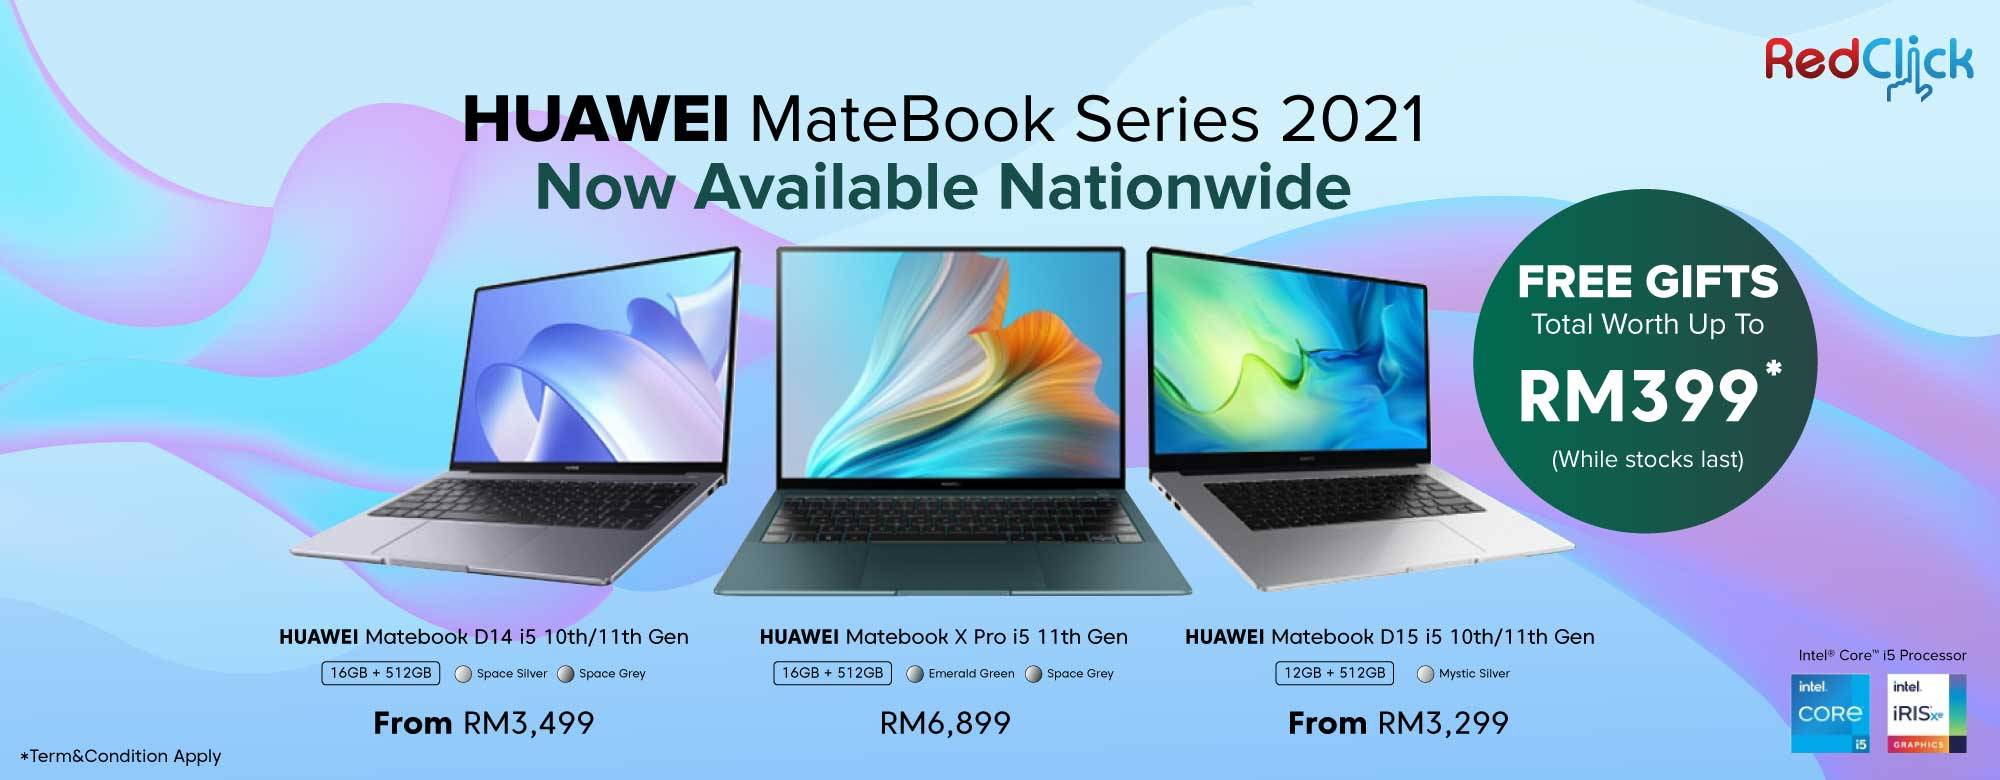 Huawei Matebook Series